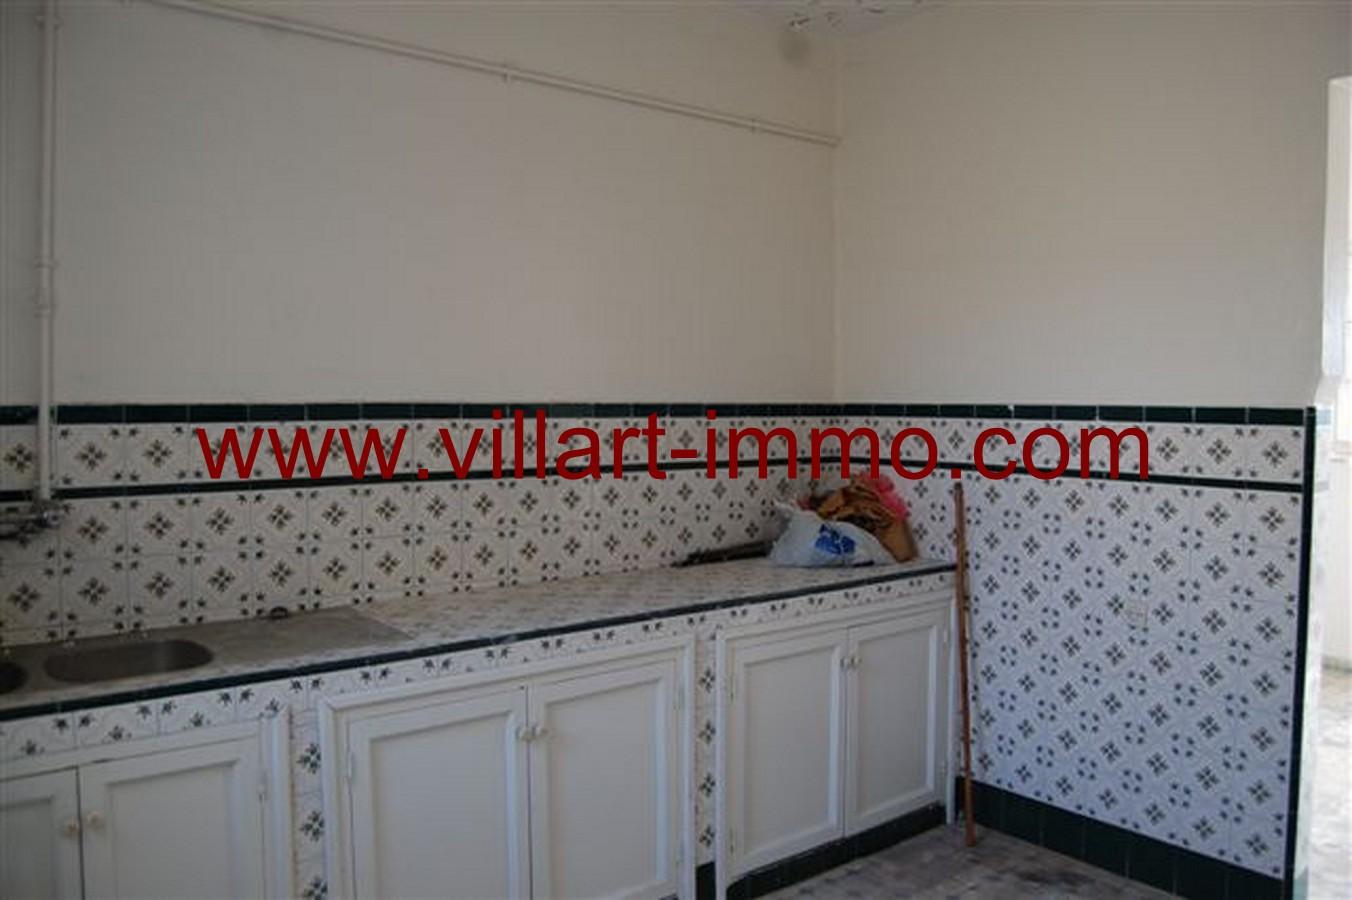 7-Vente-Appartement-Tanger-Cuisine -VA532-Jirari-Villart Immo